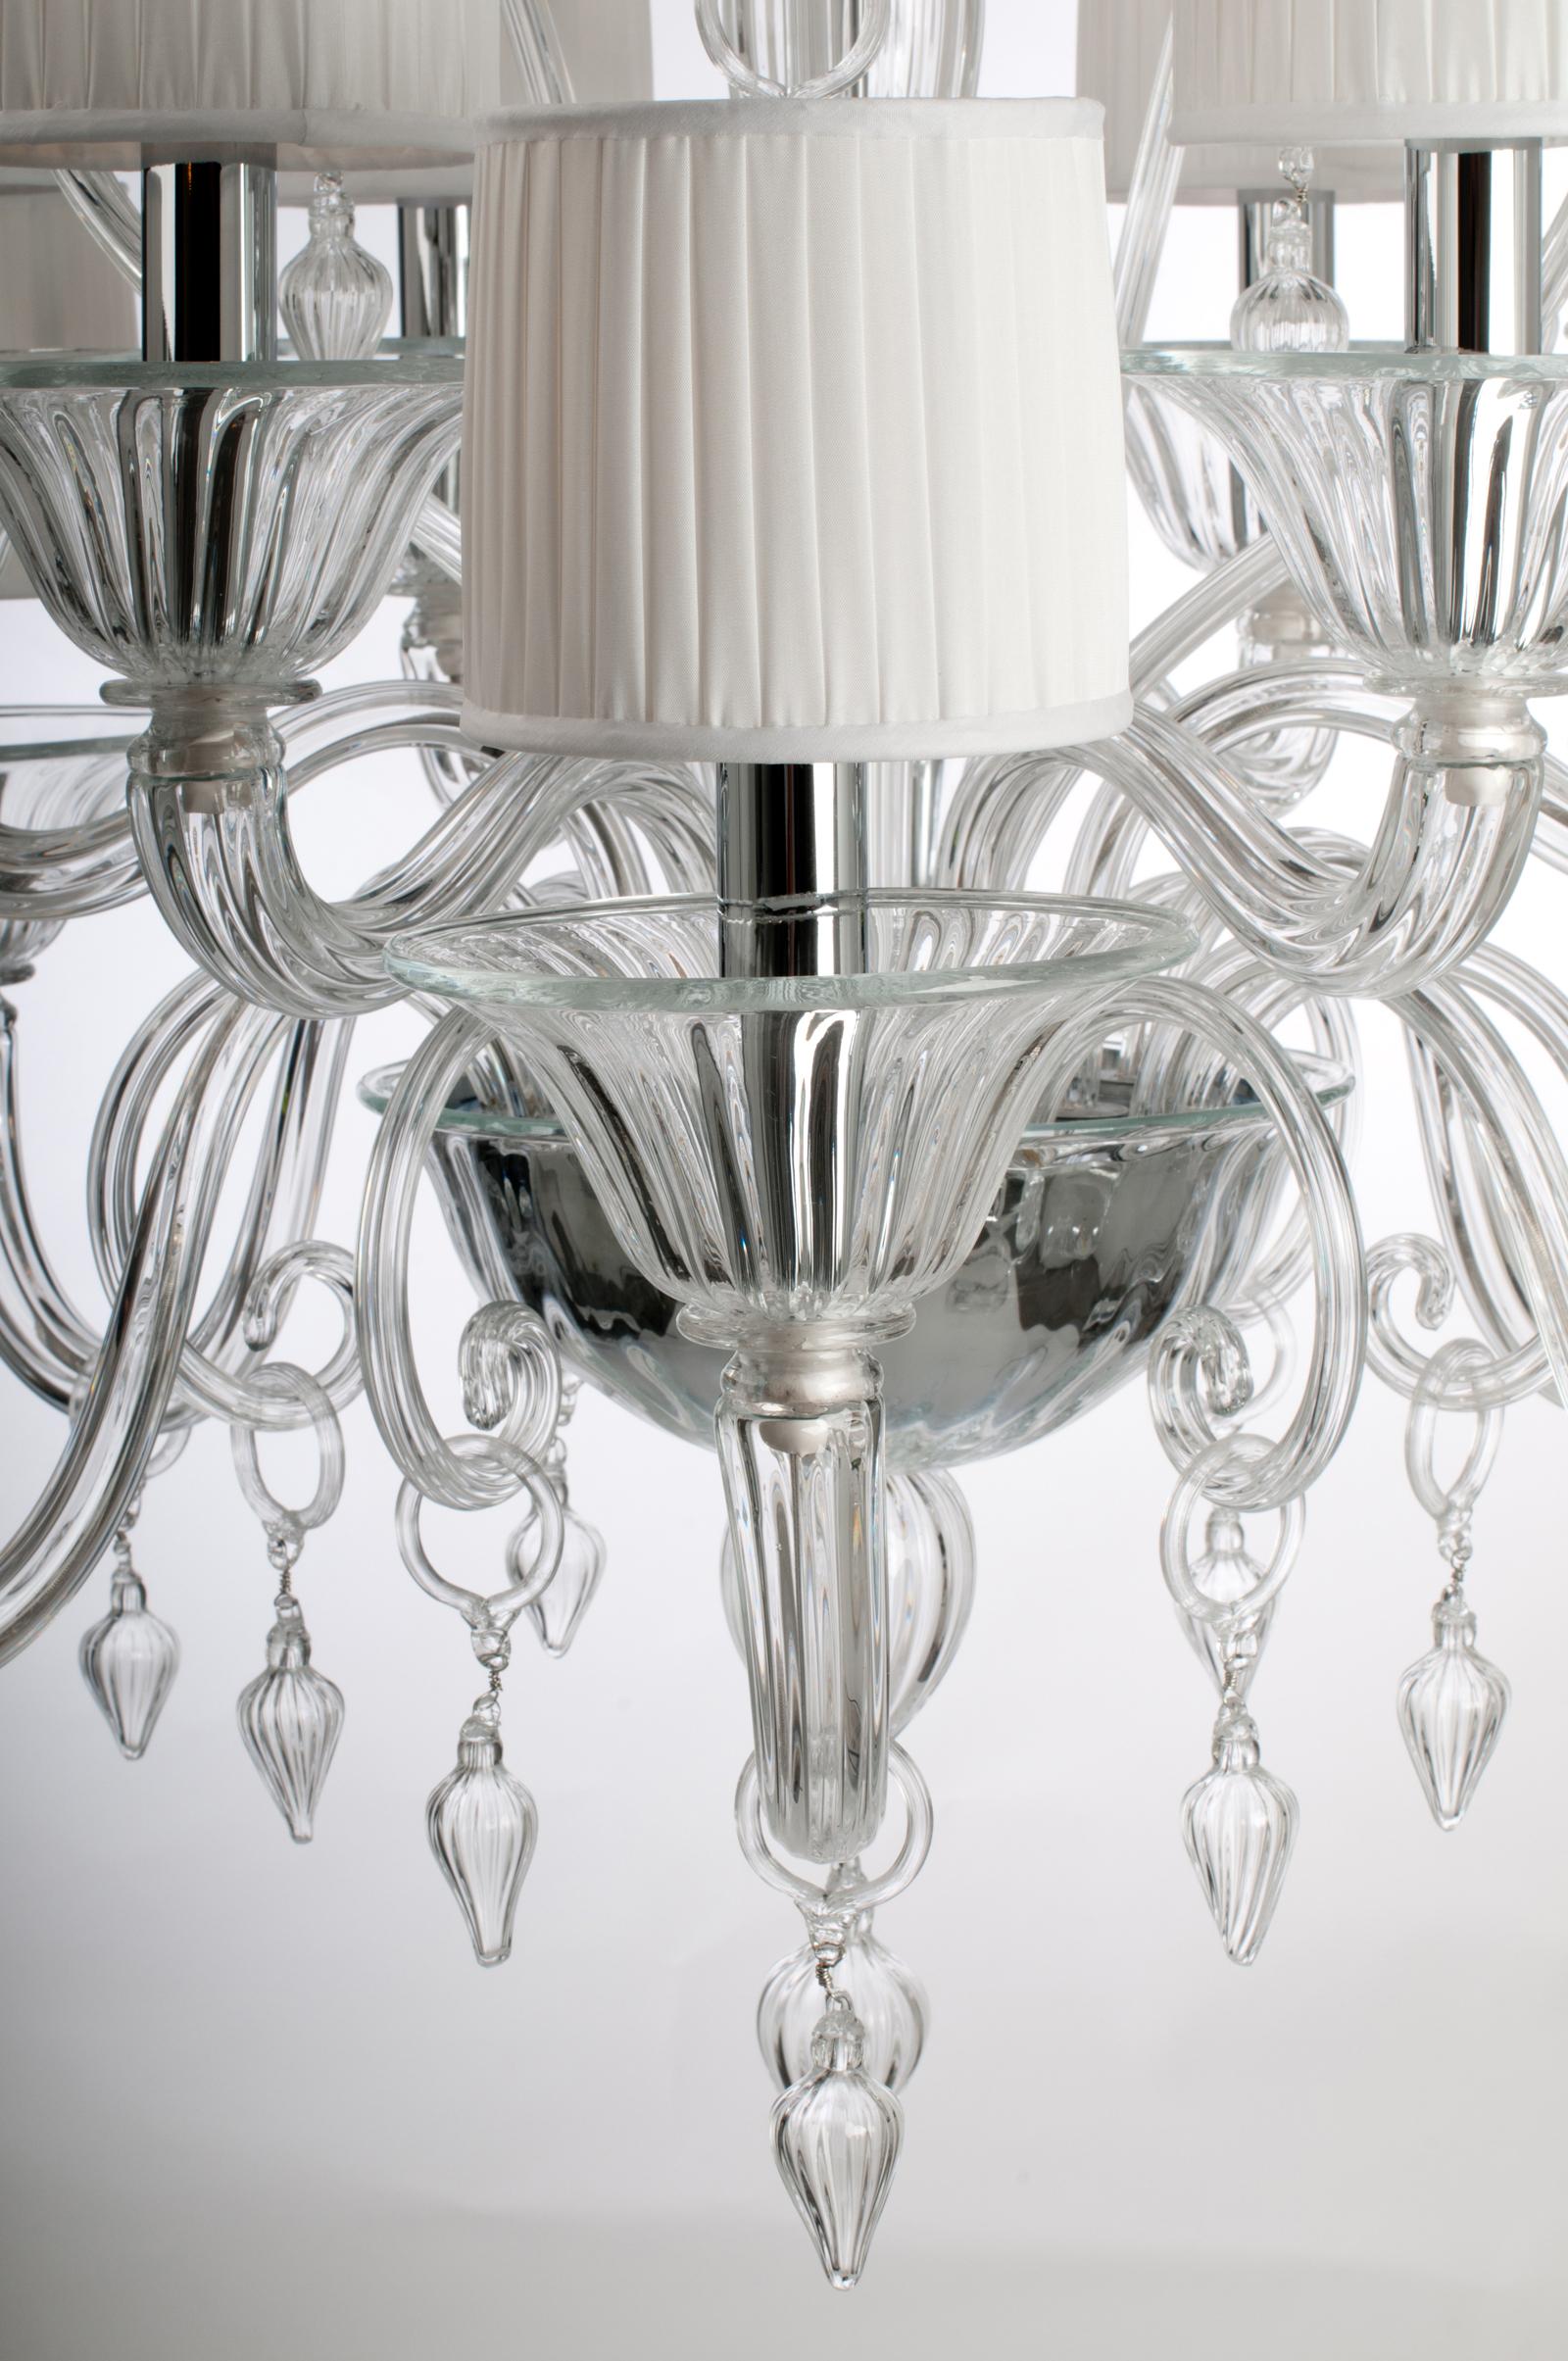 cachemire-lustre-chandelier-veronese-8.jpg